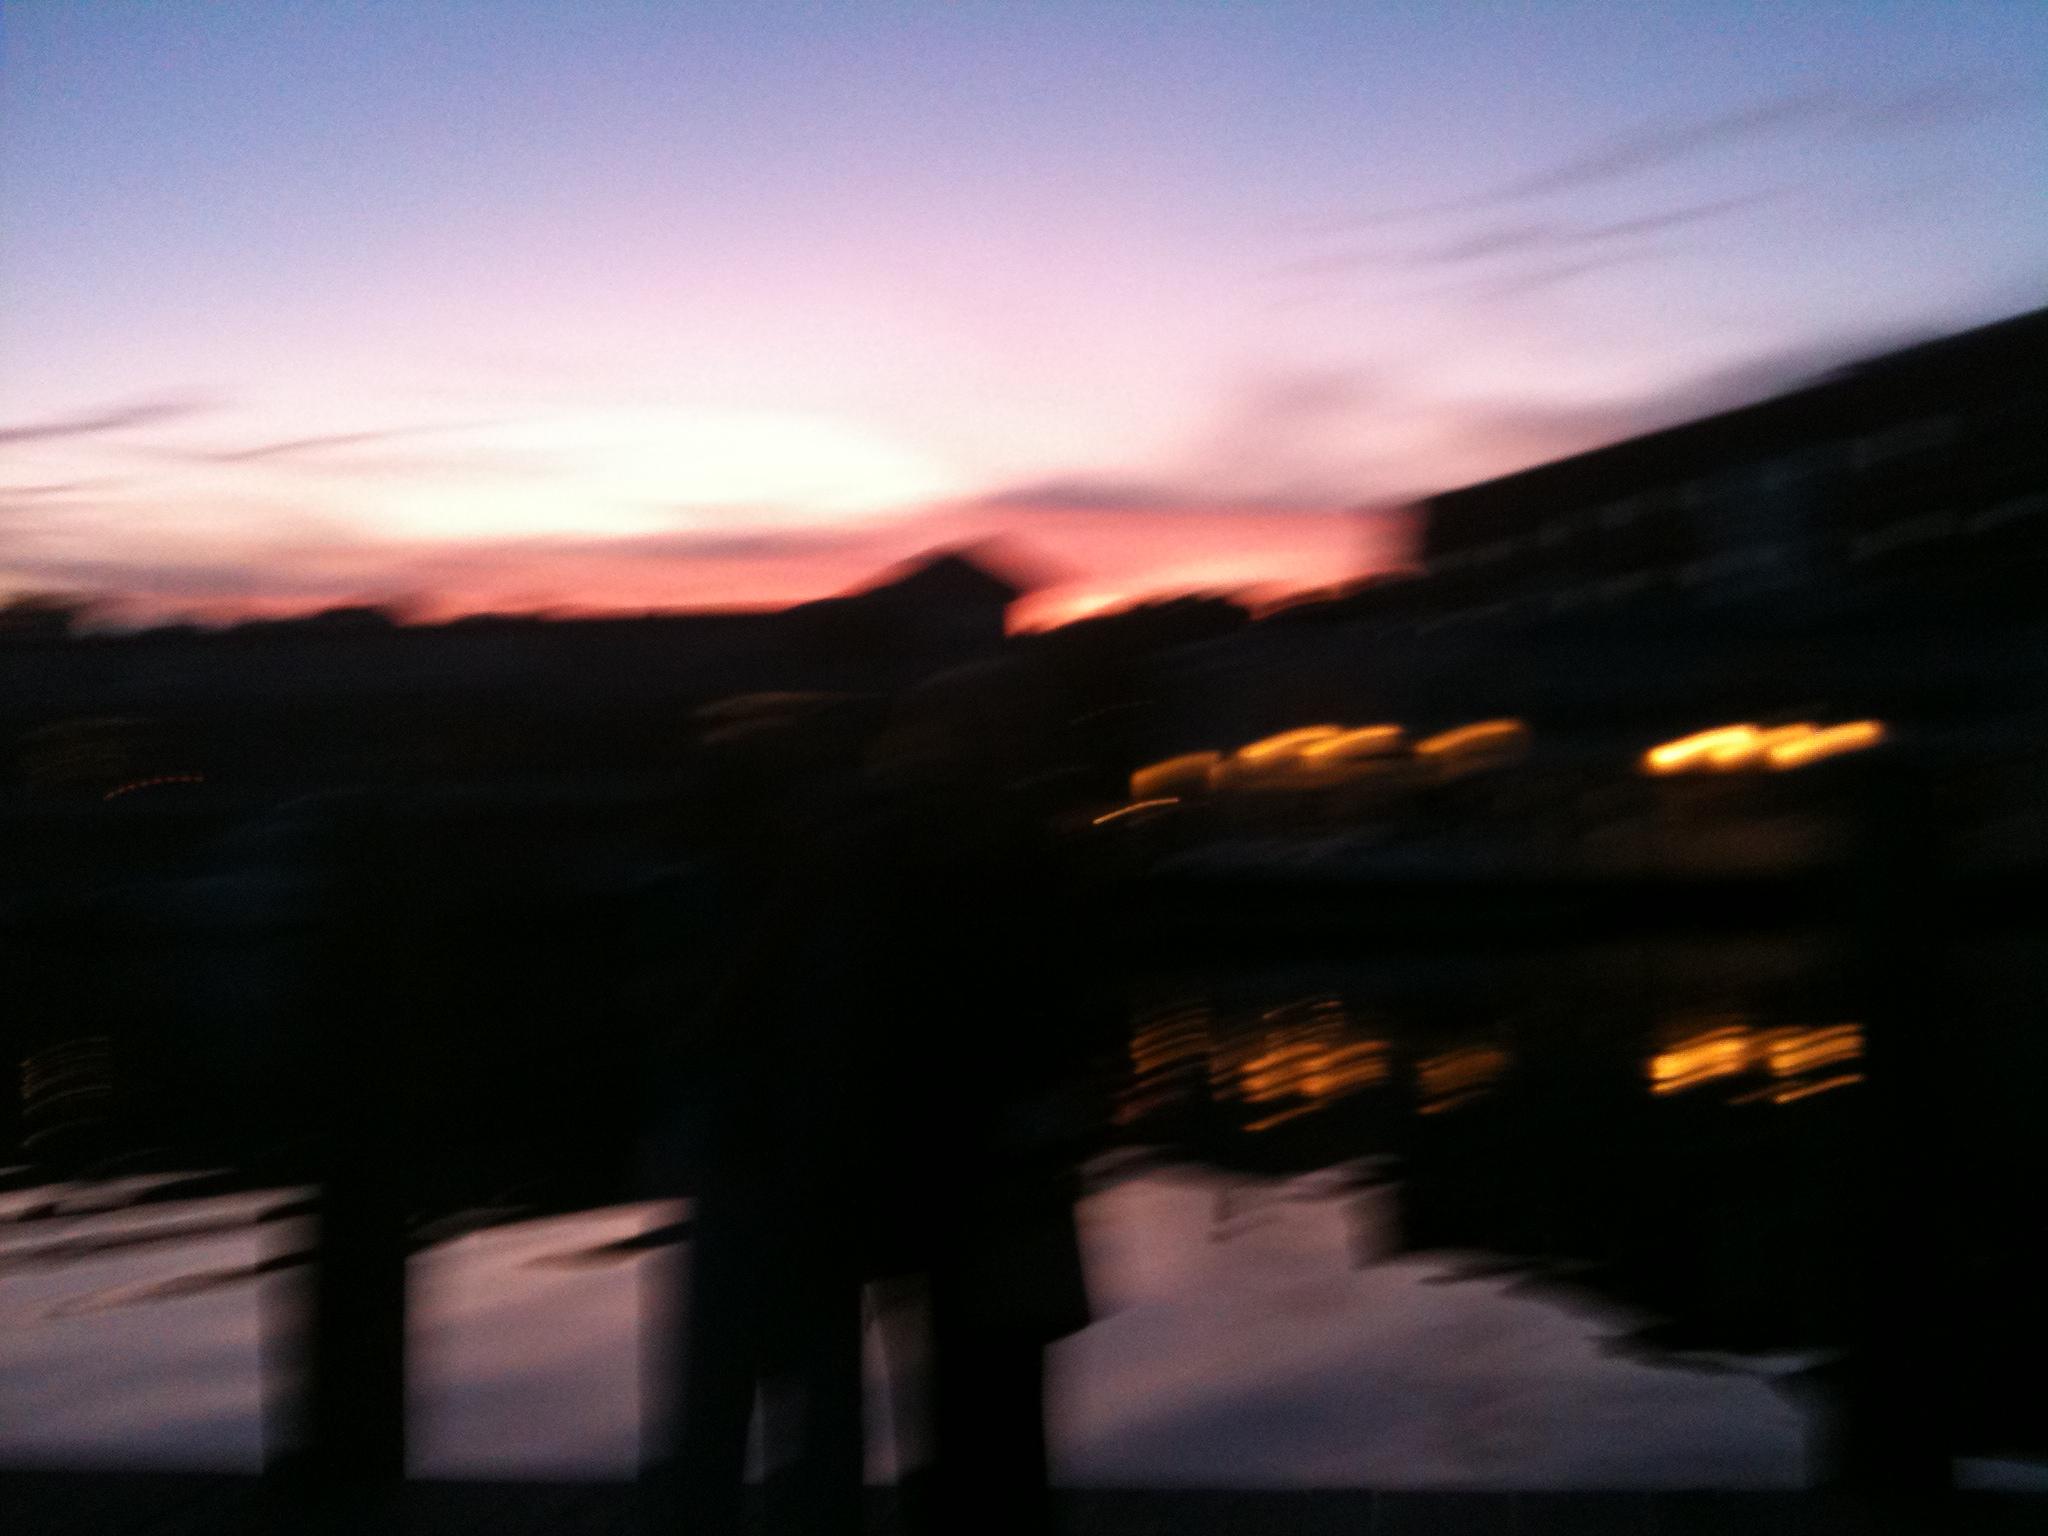 Vibrant Skies at Water's Edge